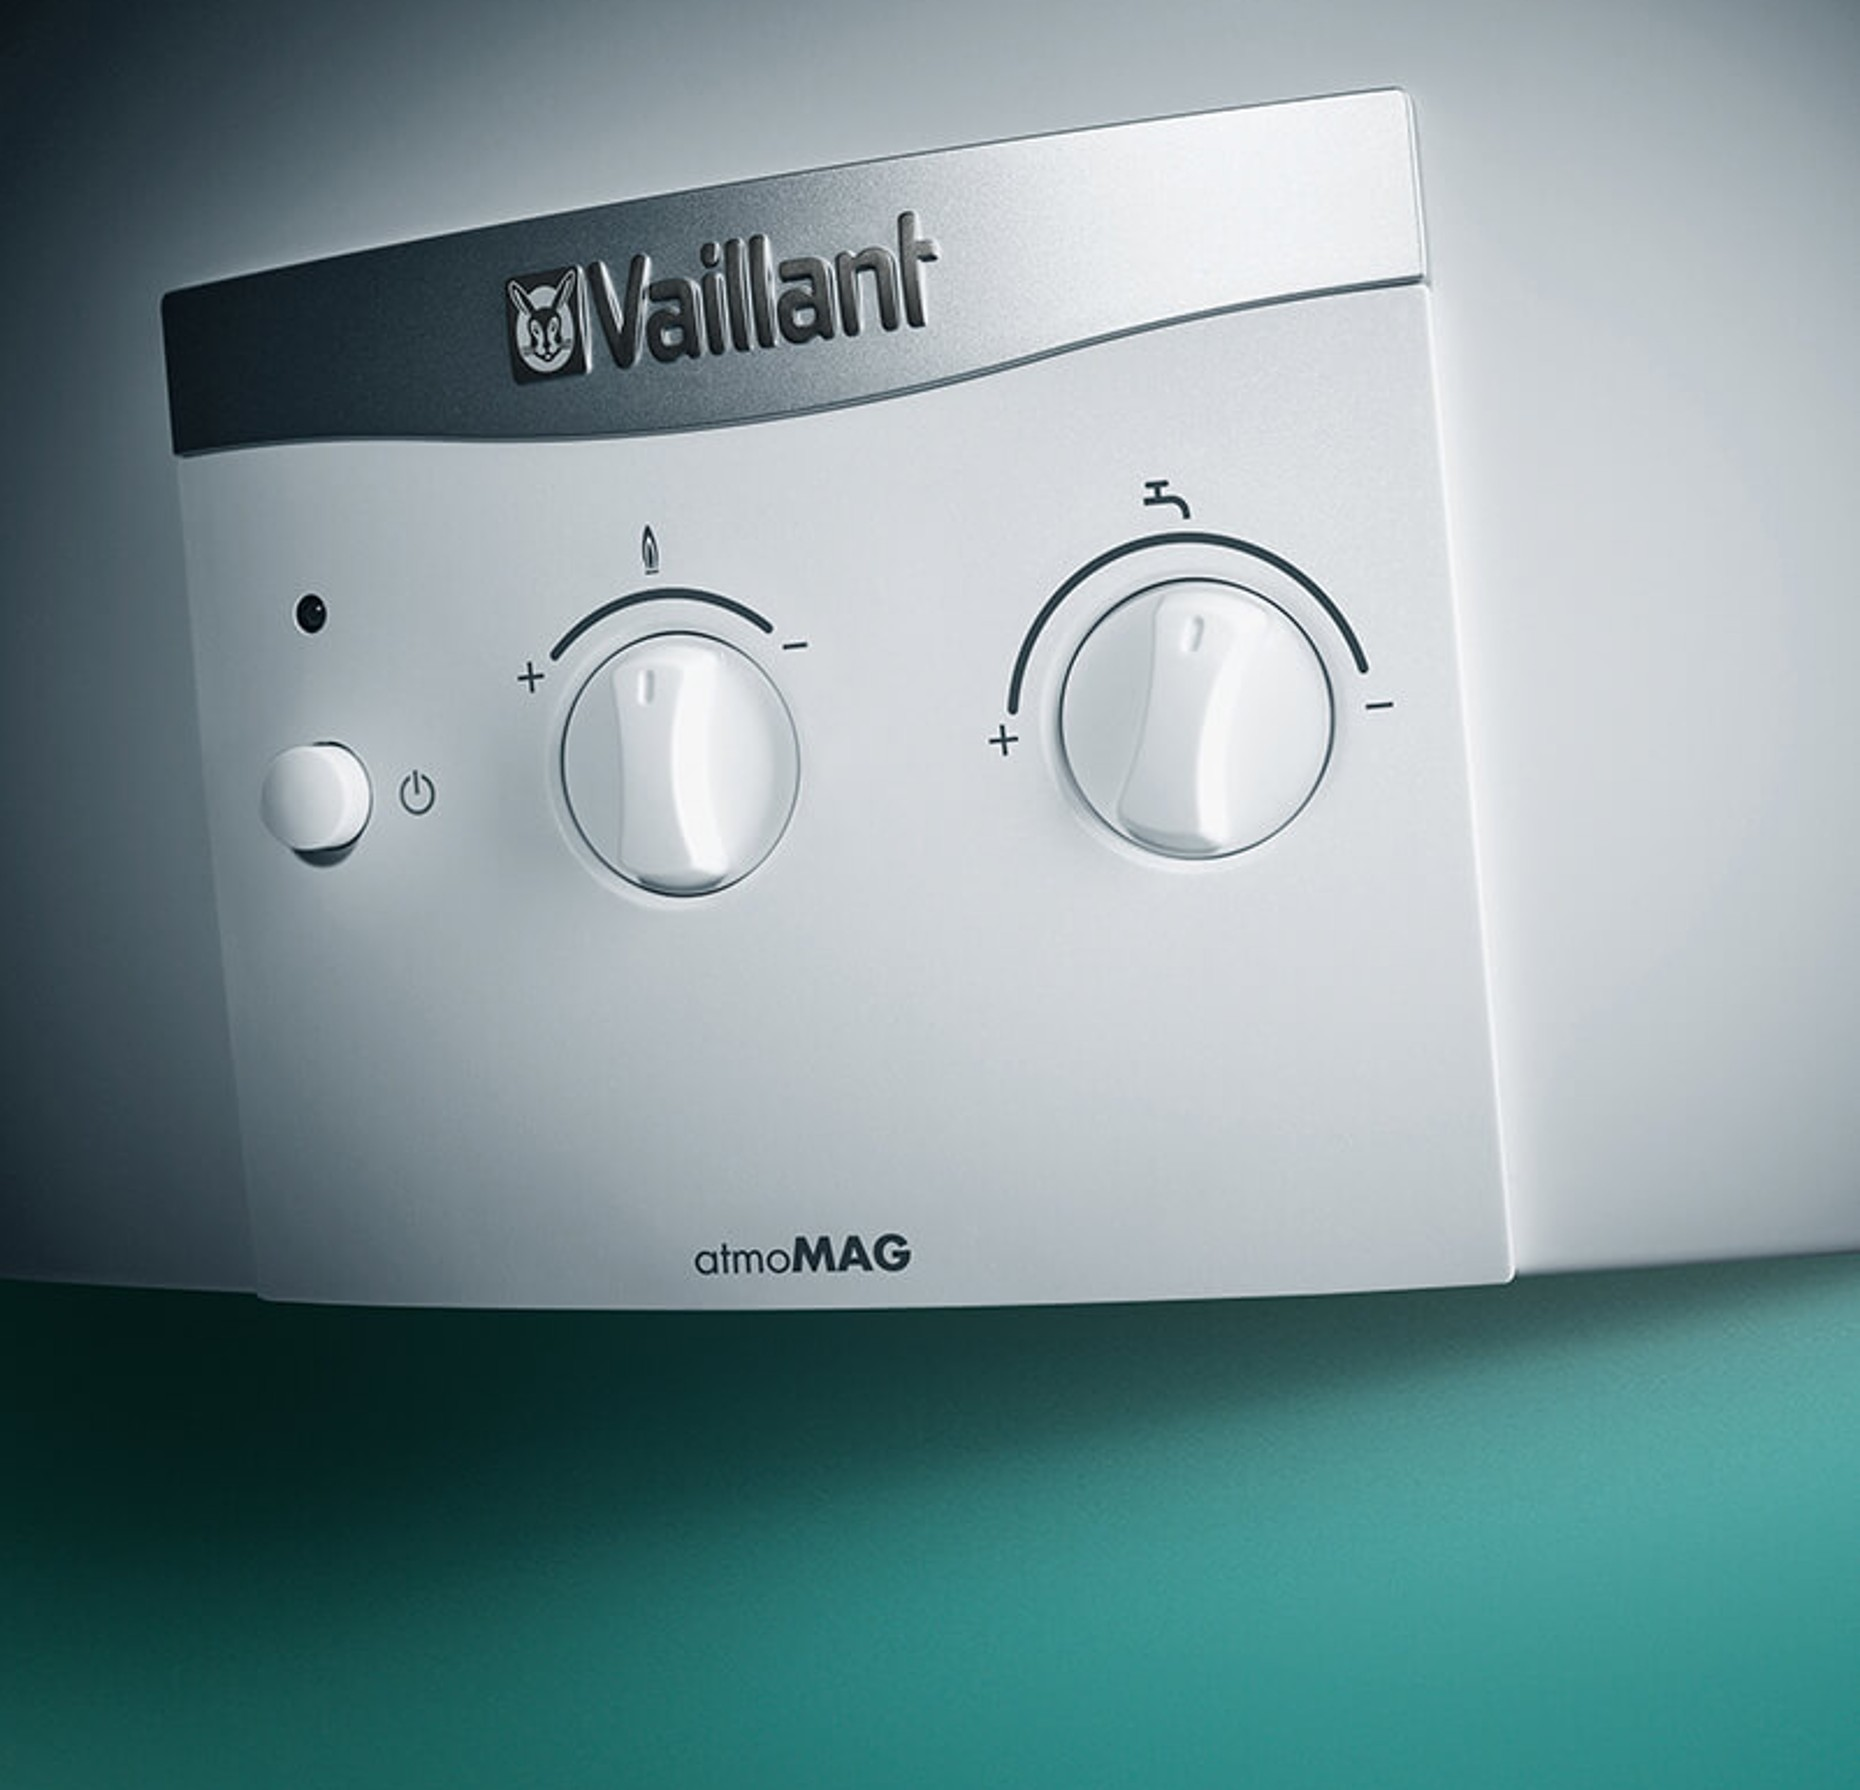 gas durchlauferhitzer atmomag gx vaillant. Black Bedroom Furniture Sets. Home Design Ideas